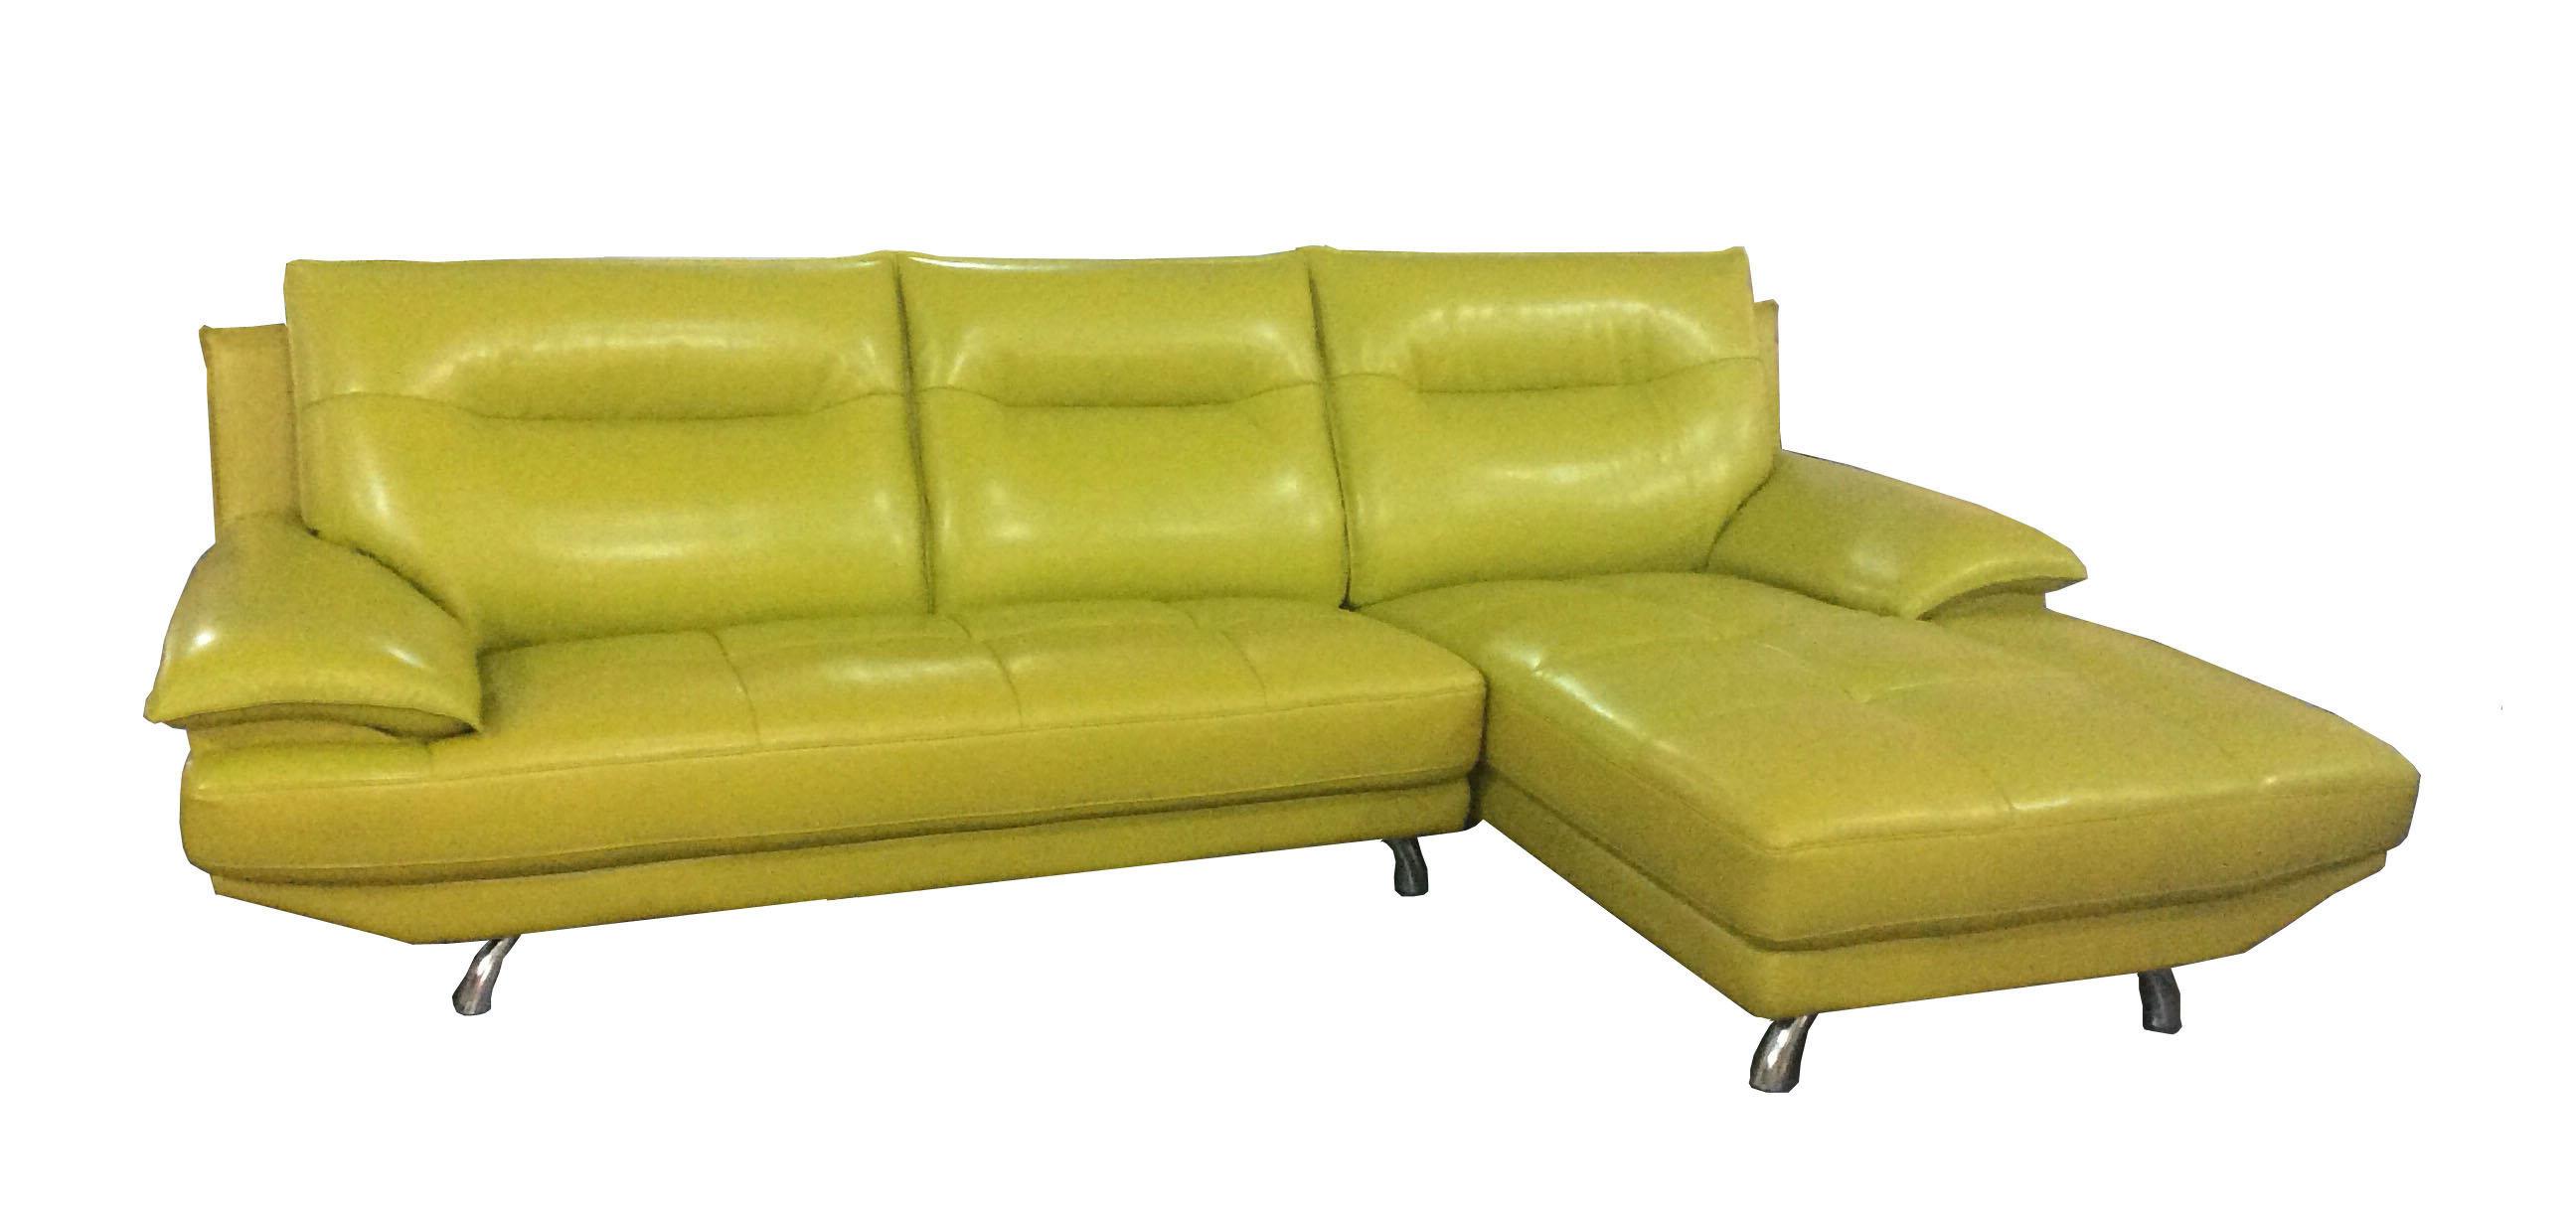 China Lemon Color Modern Genuine Leather Sofa 612 s